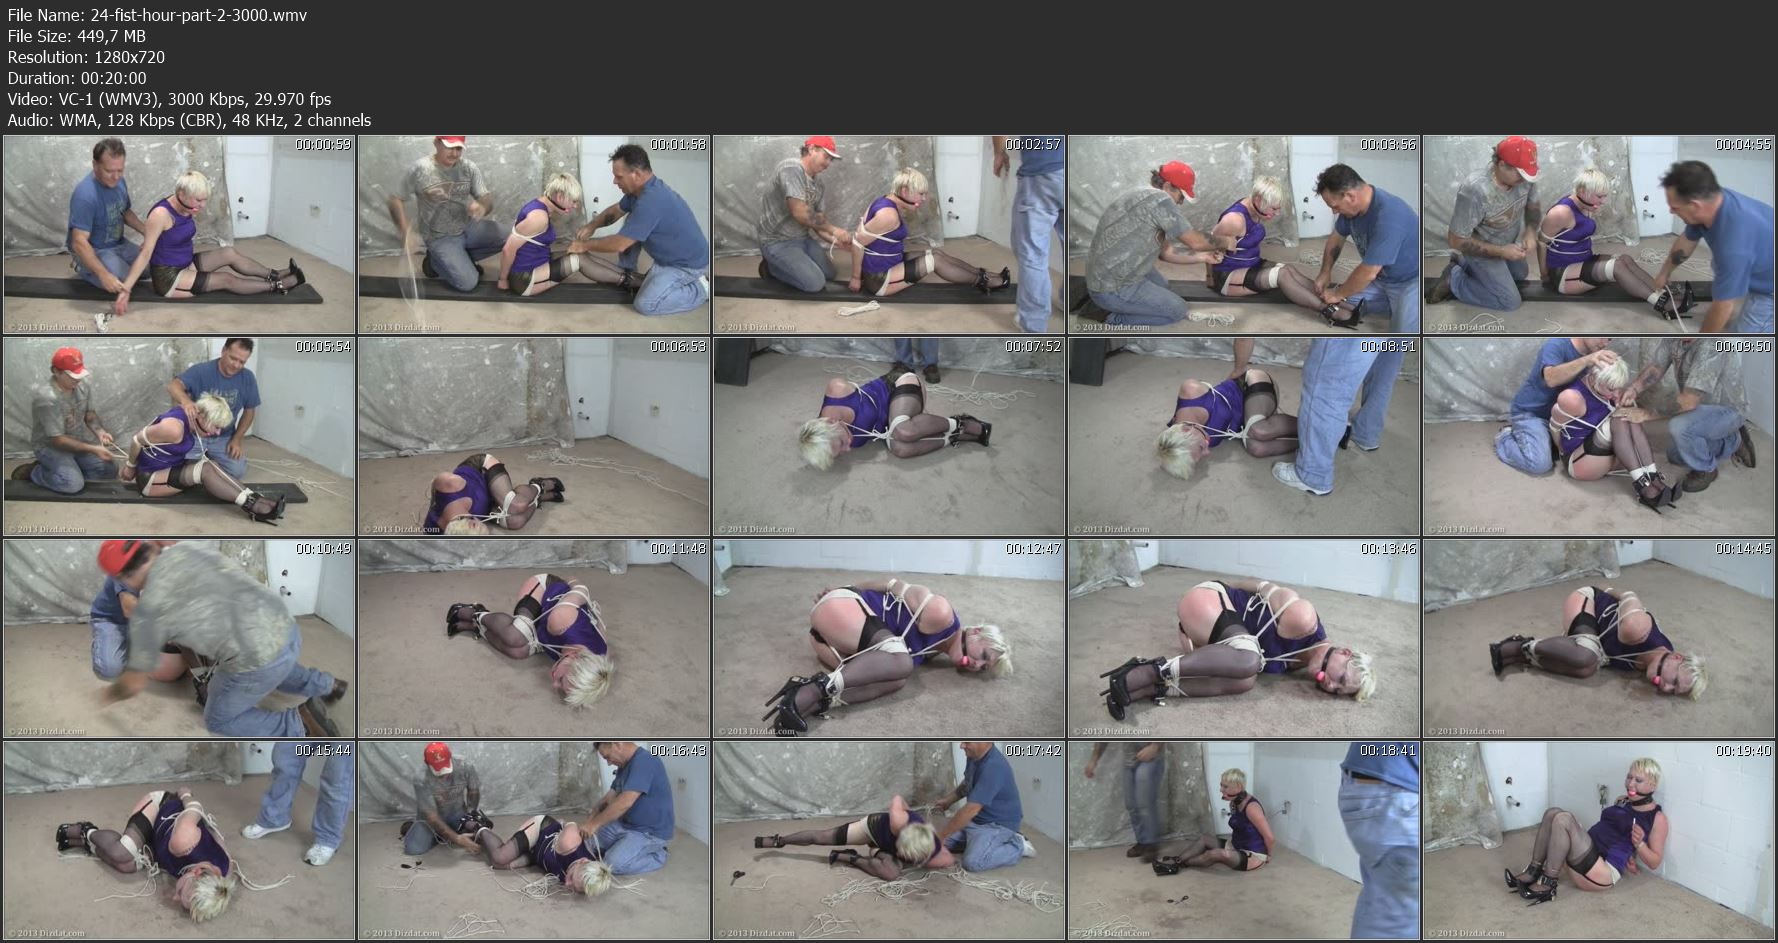 24-fist-hour-part-2-3000__image_3_.jpg